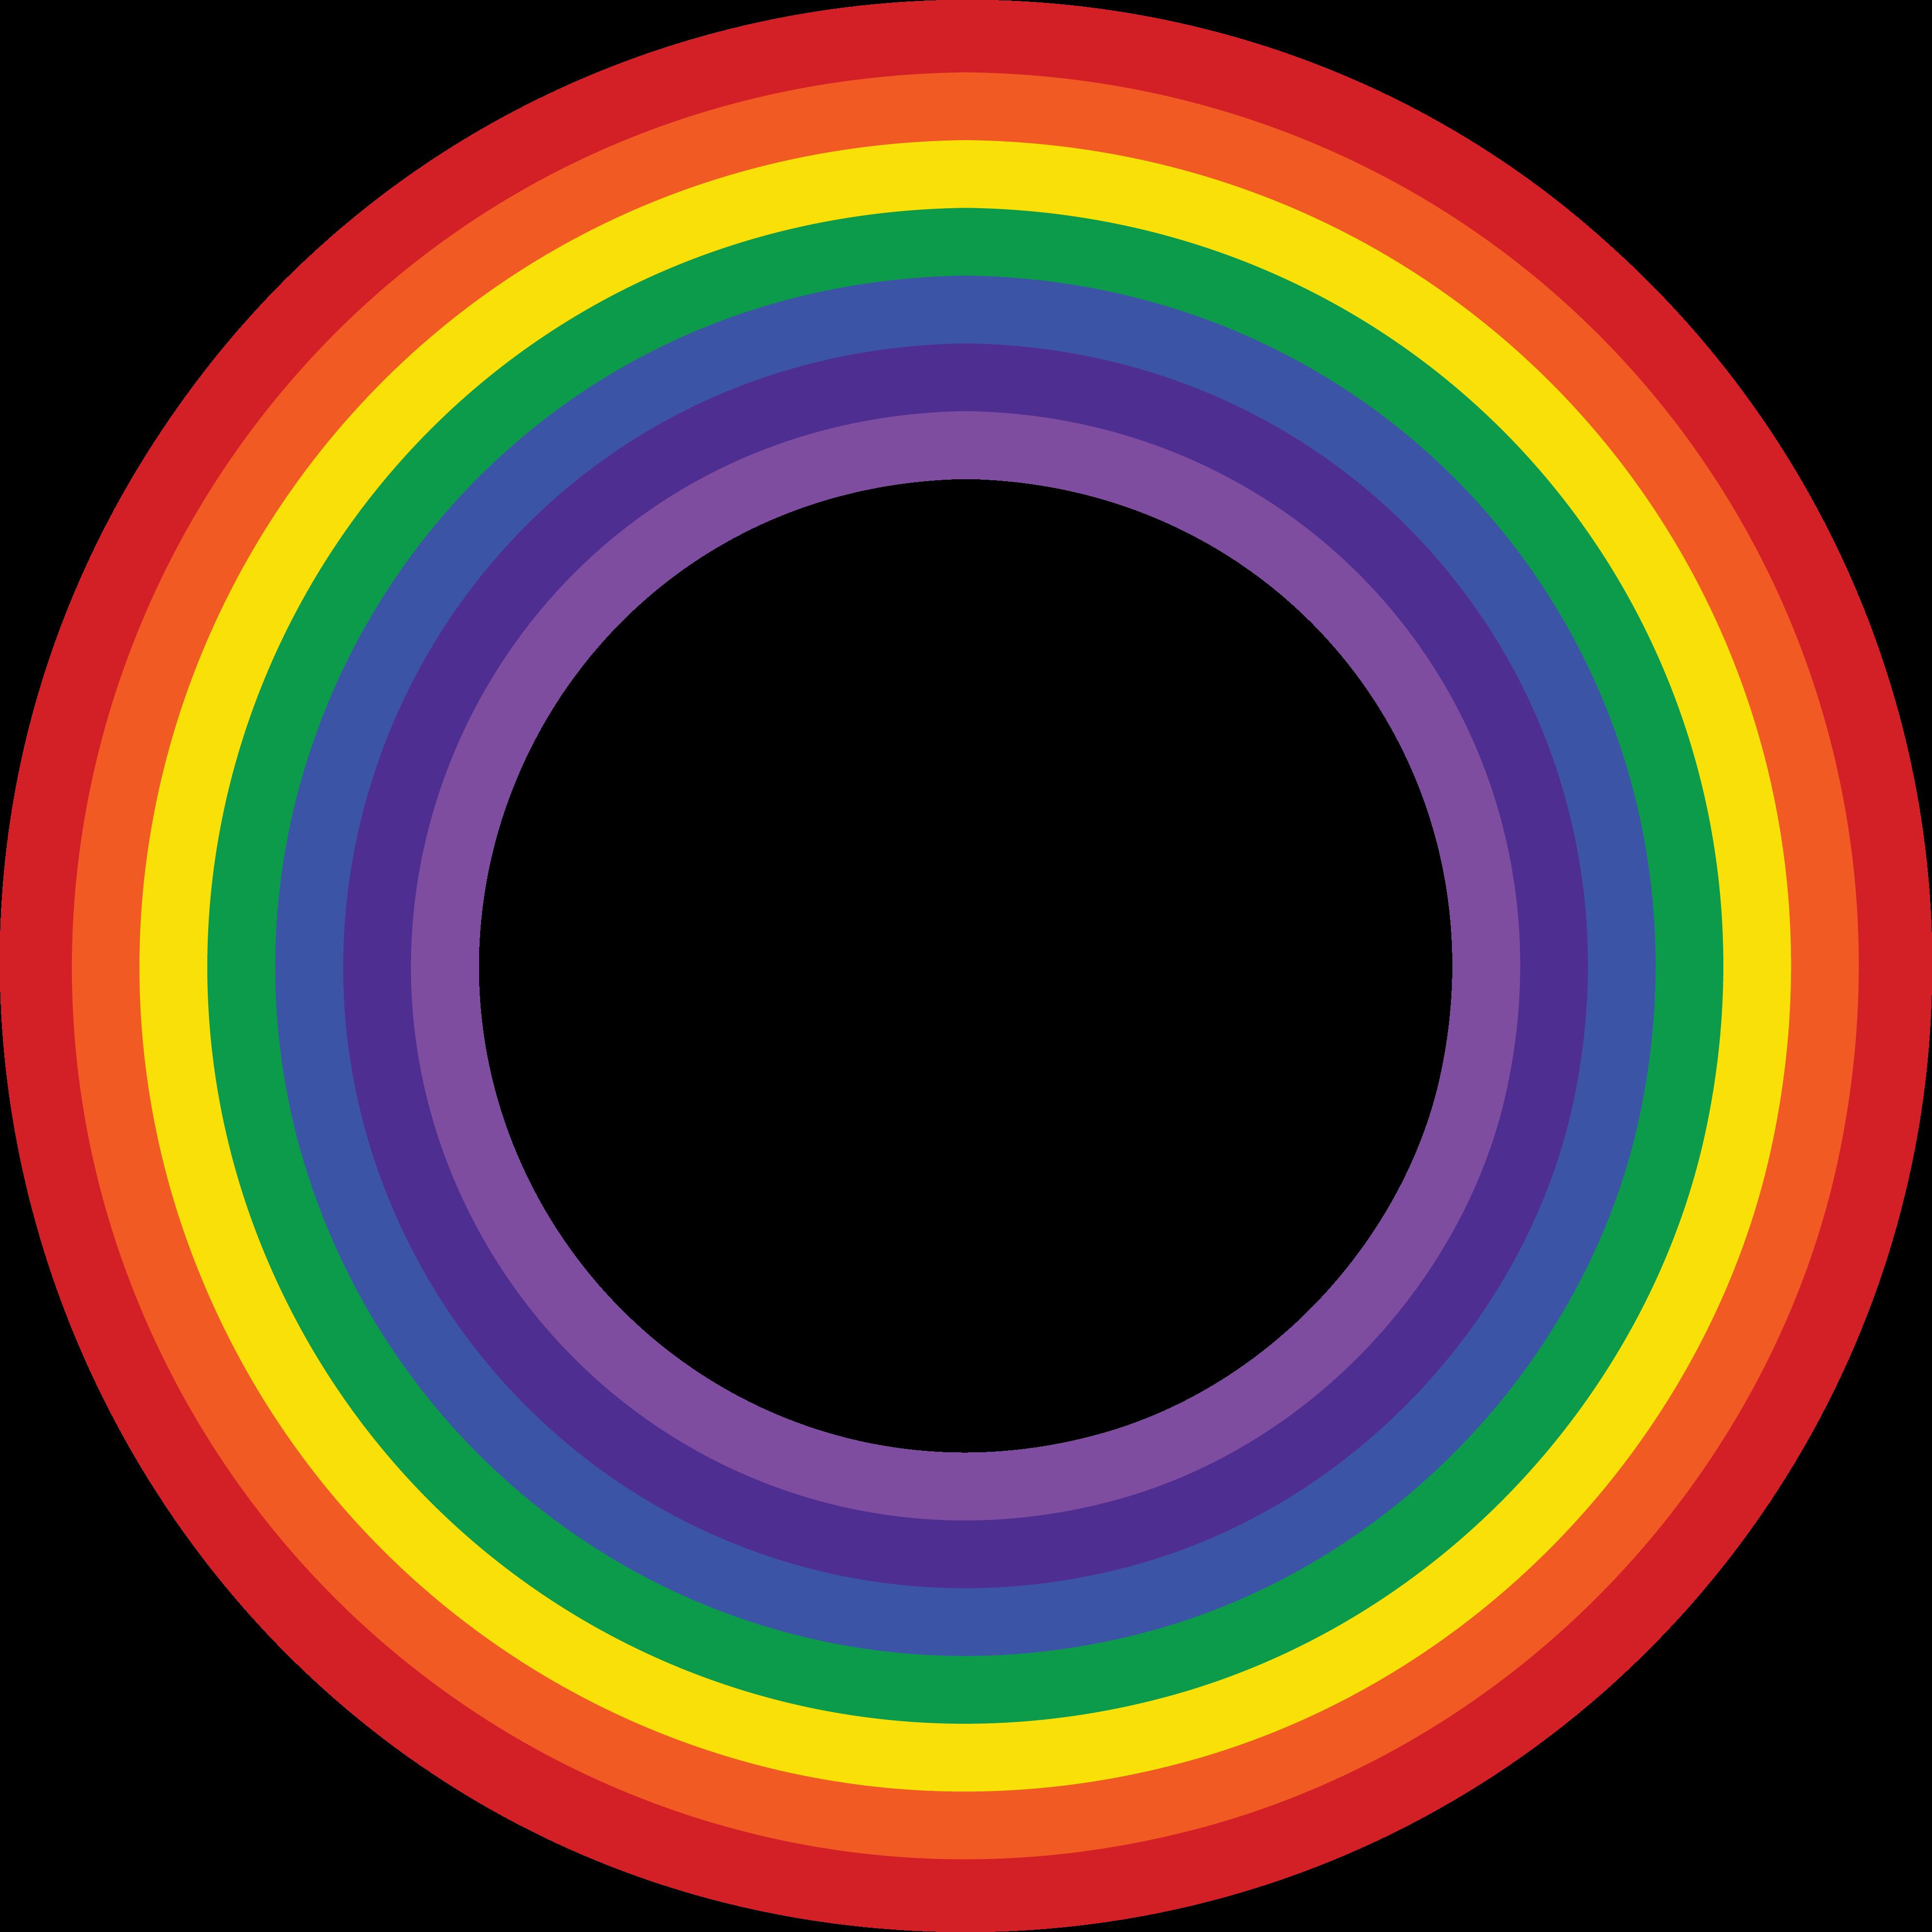 4000x3999 Free Clipart Of A Rainbow Border